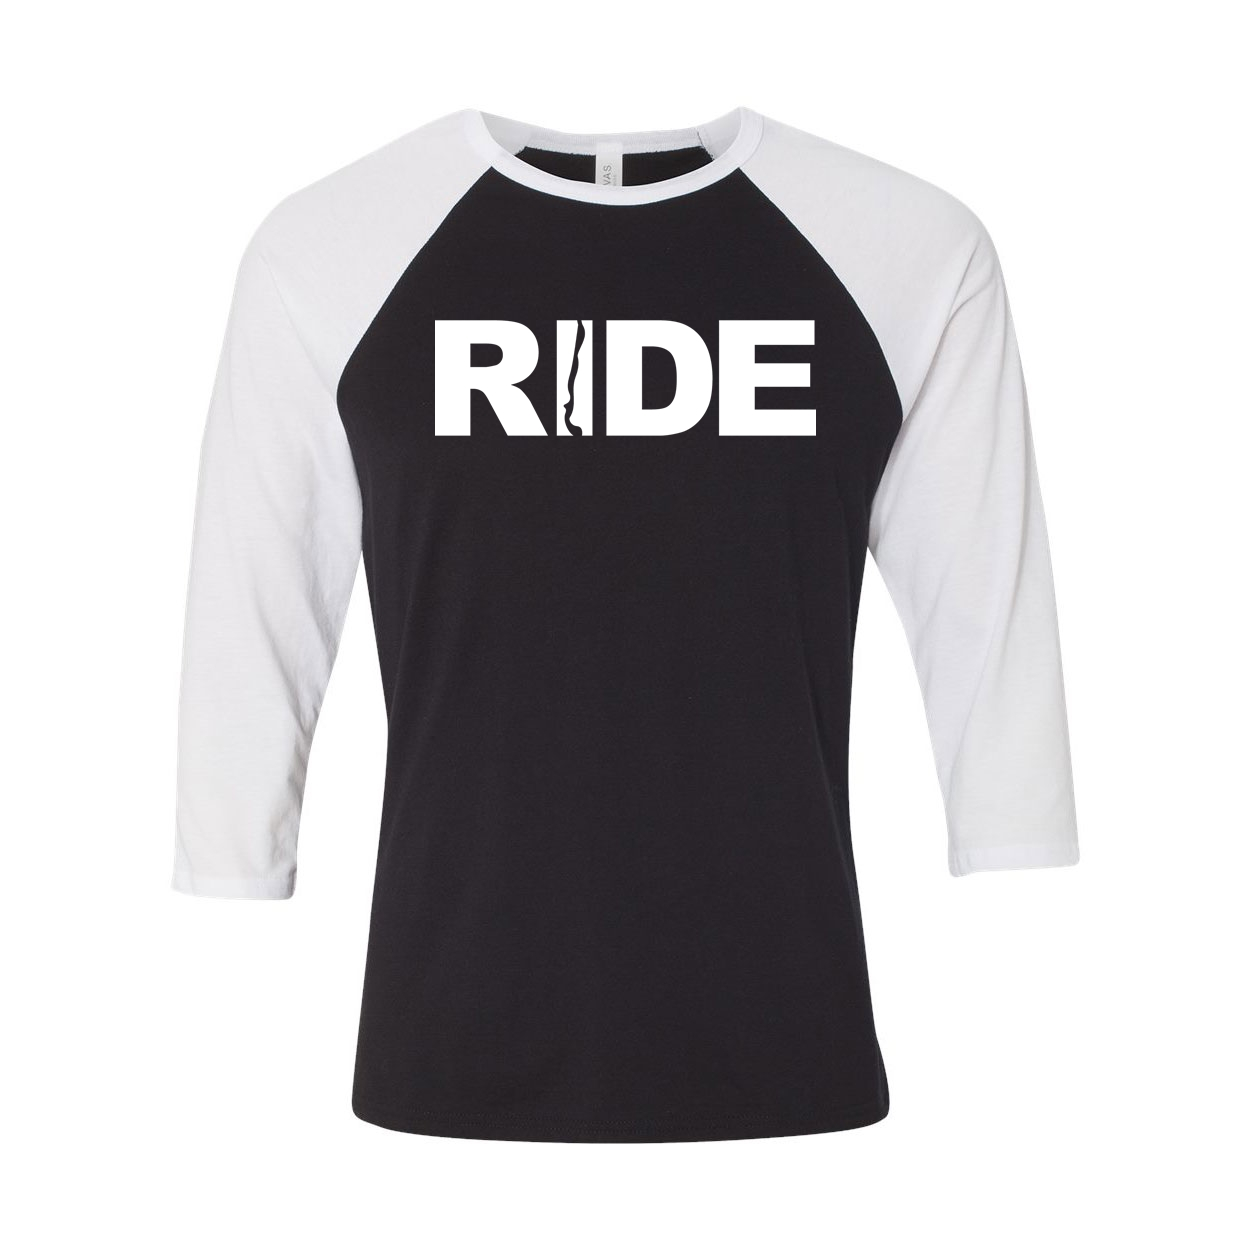 Ride Chile Classic Raglan Shirt Black/White (White Logo)